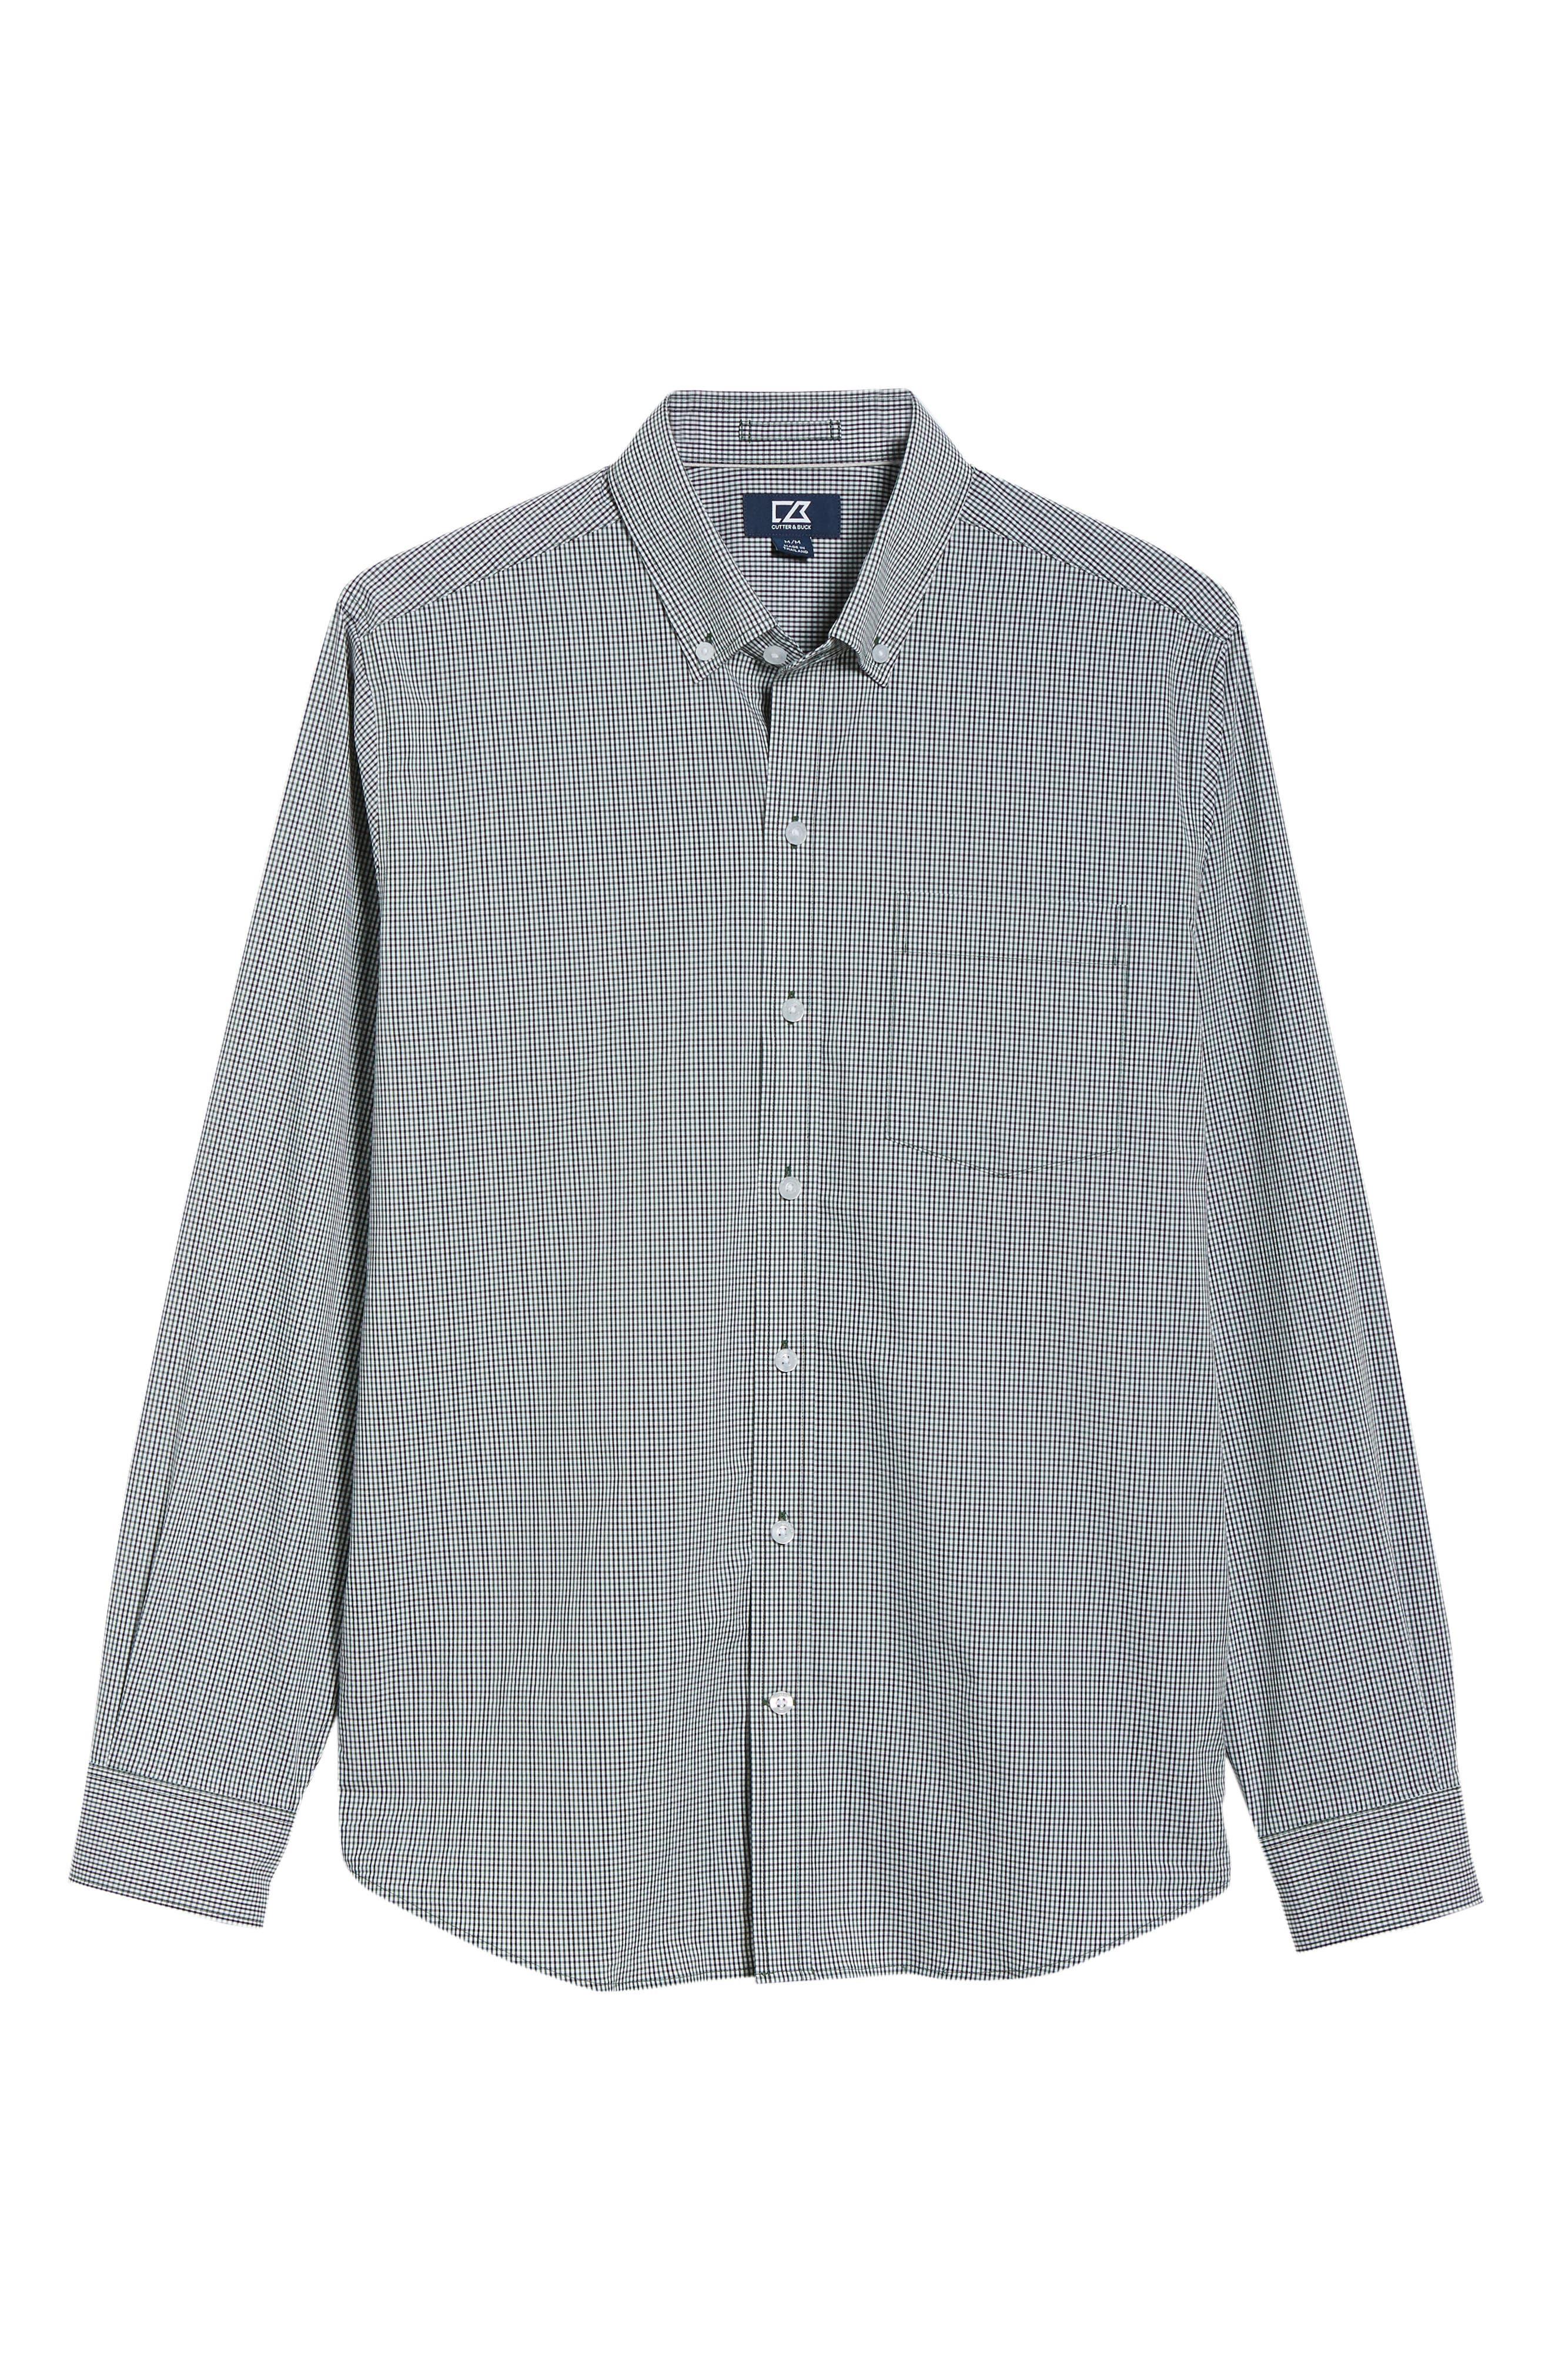 Casey Regular Fit Check Sport Shirt,                             Alternate thumbnail 5, color,                             HUNTER